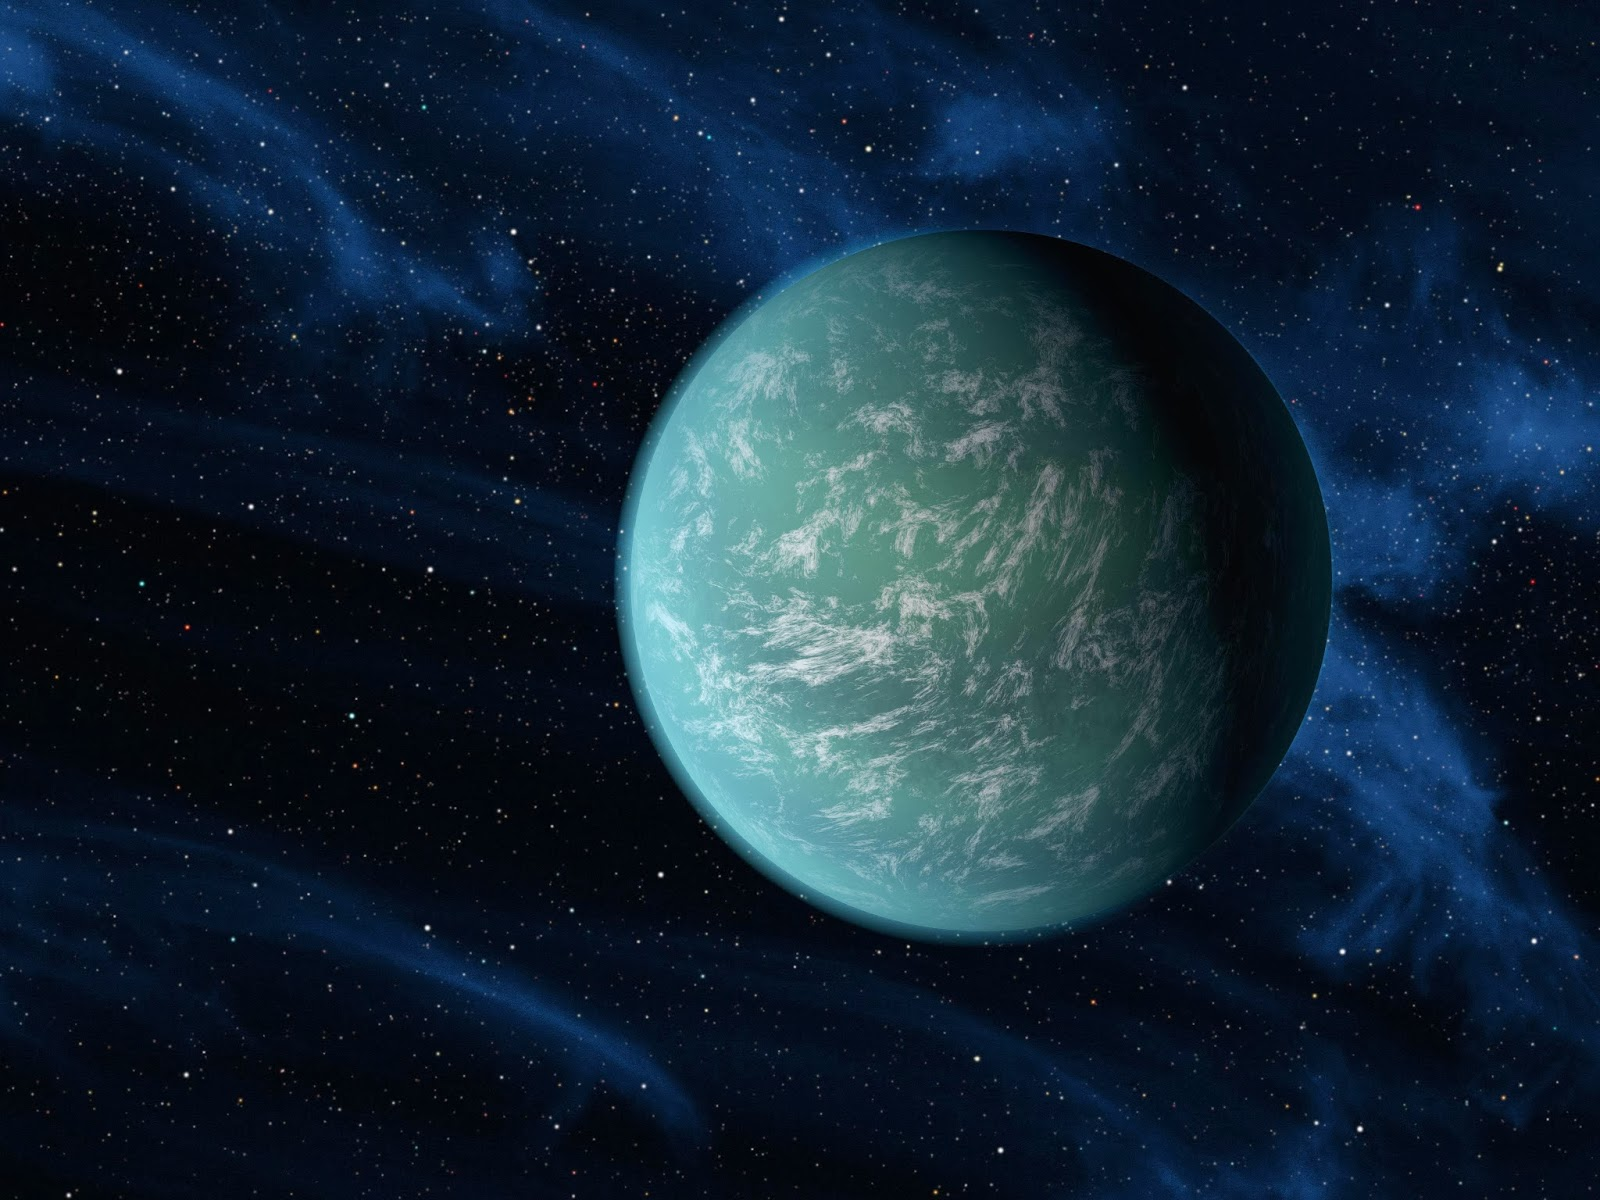 earth like world planet - photo #18